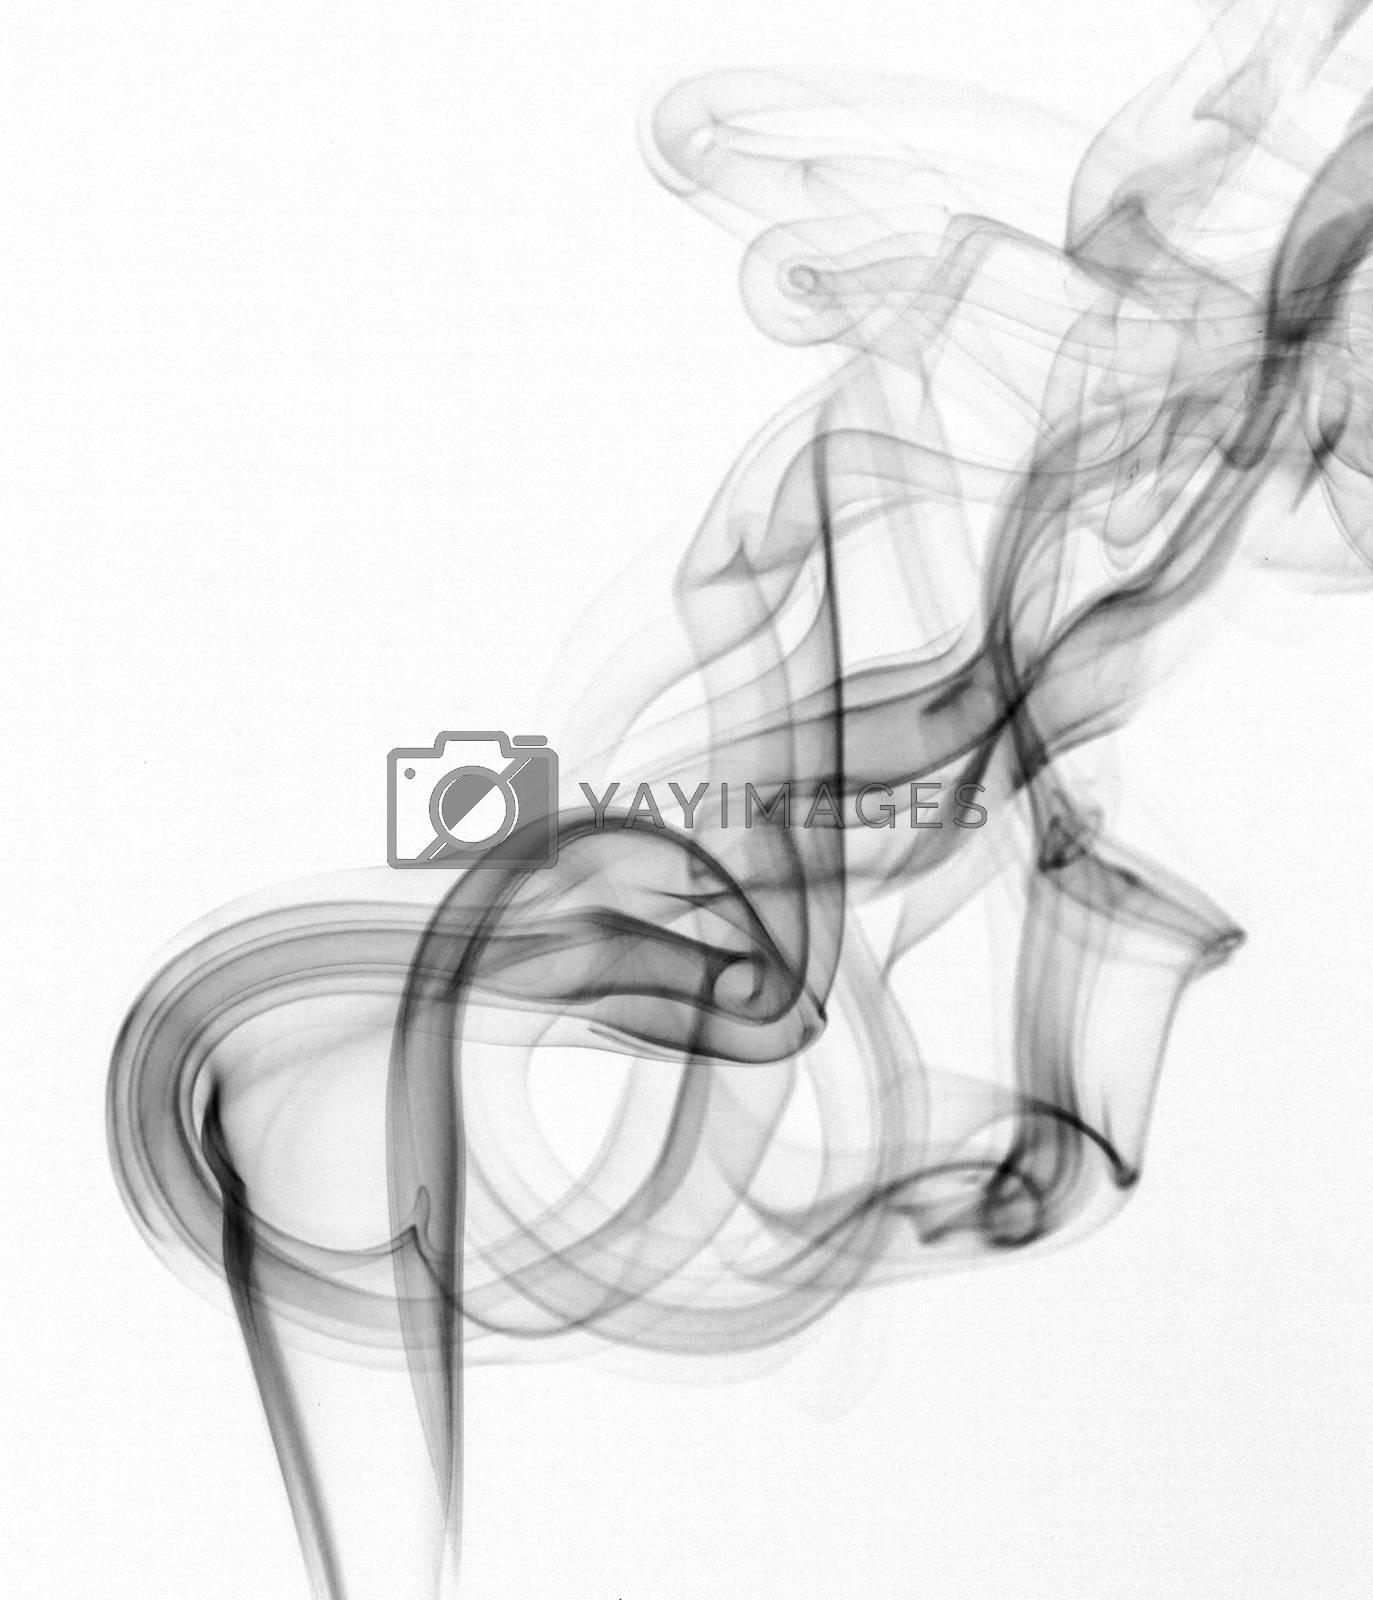 Royalty free image of Abstract smoke by Vagengeym